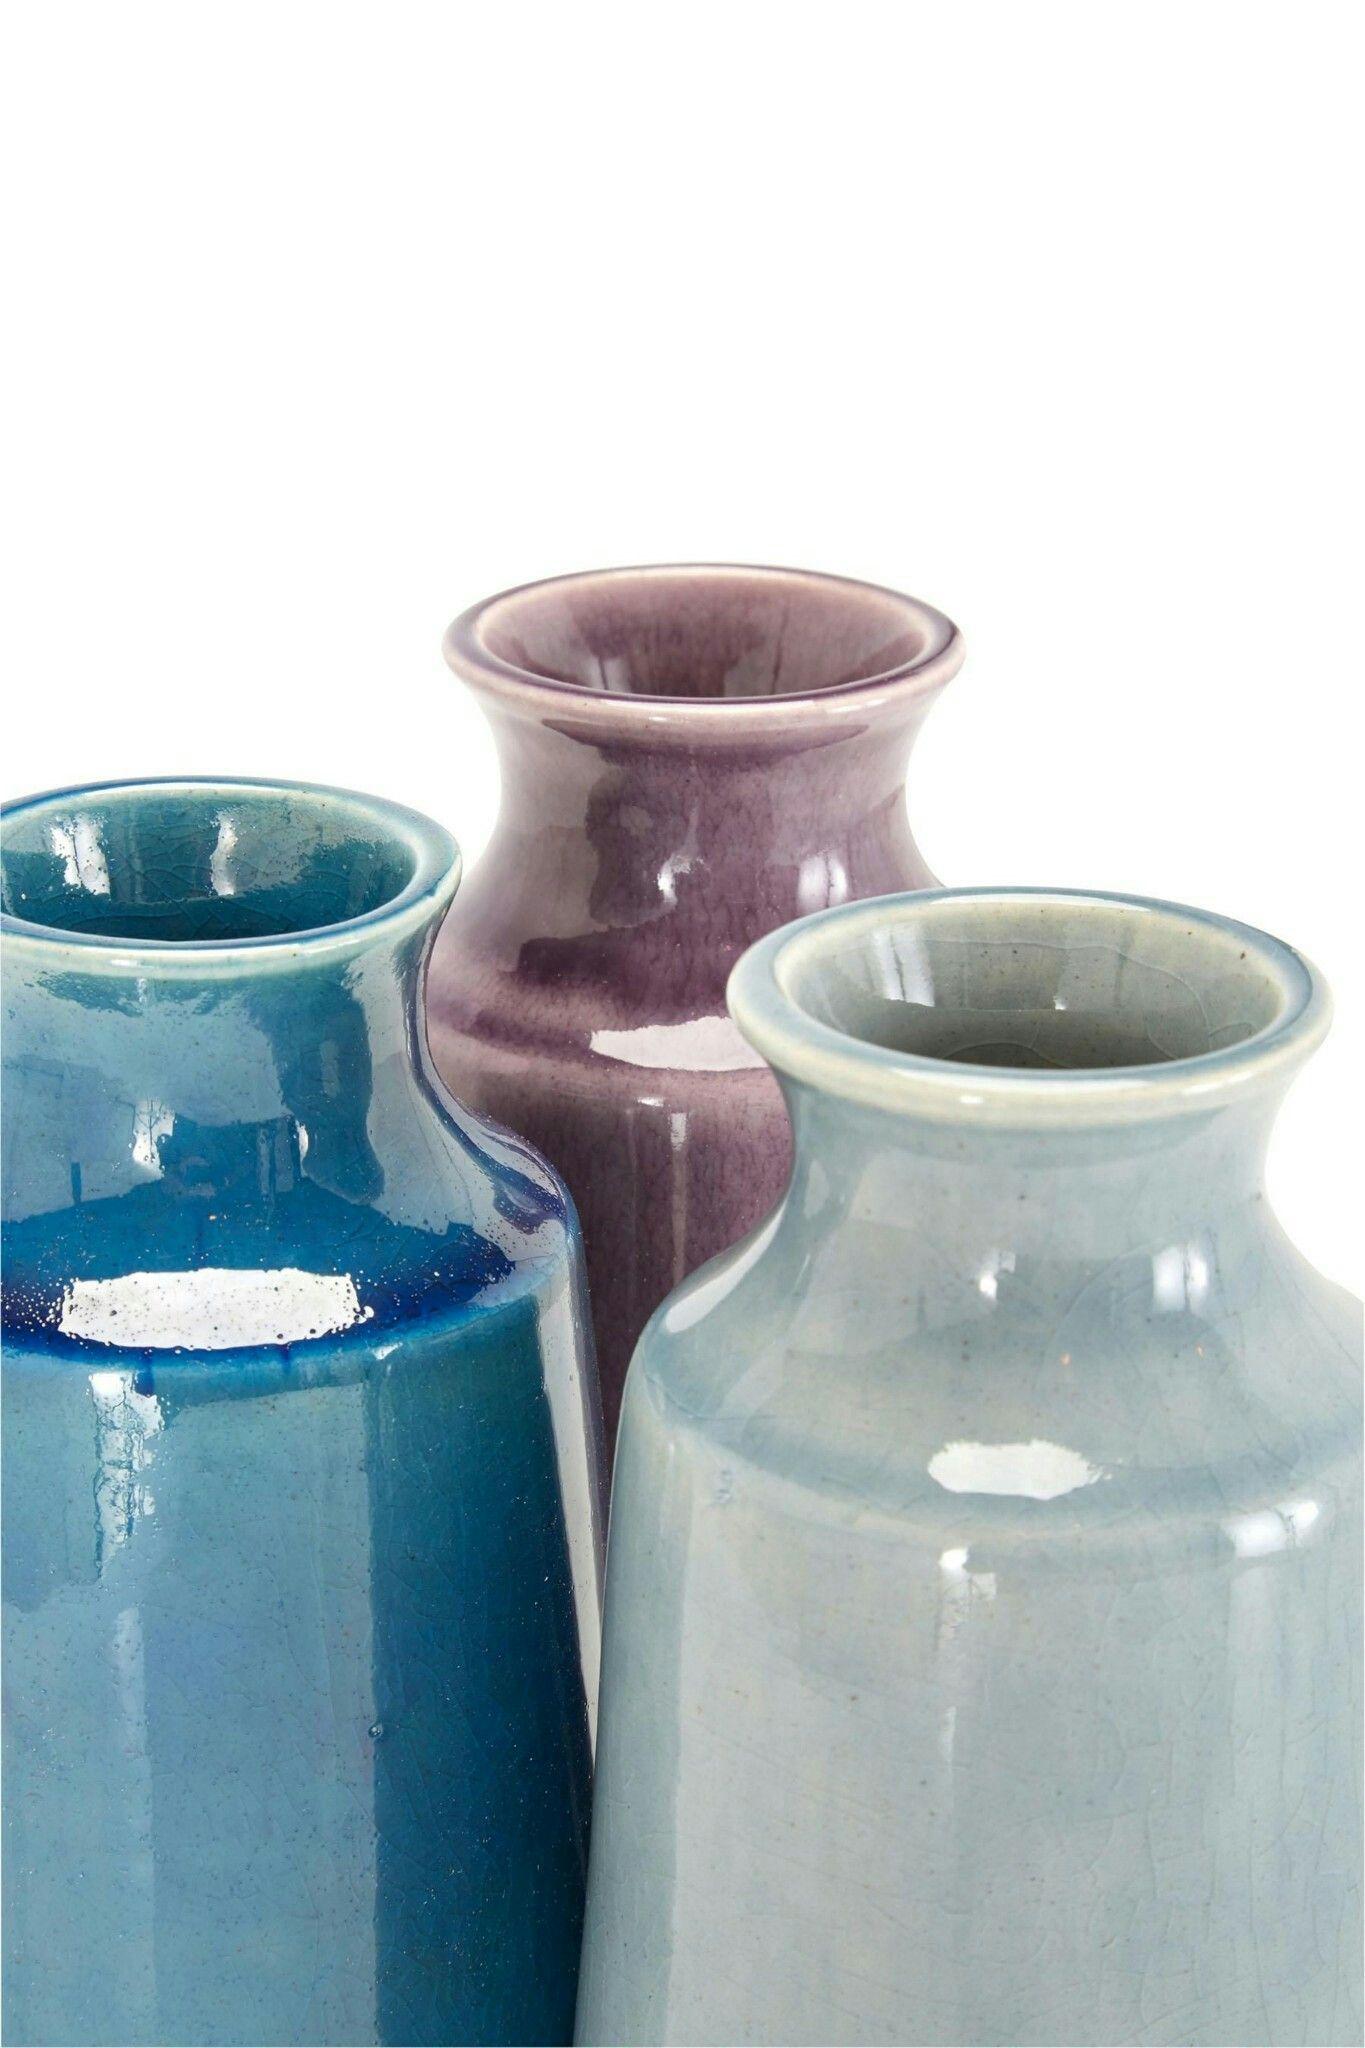 Pin by alison mcgovern on spare room scheme 2 pinterest spare room next uk ceramic vase spare room uk online vases set of online shopping bowls pottery vase reviewsmspy